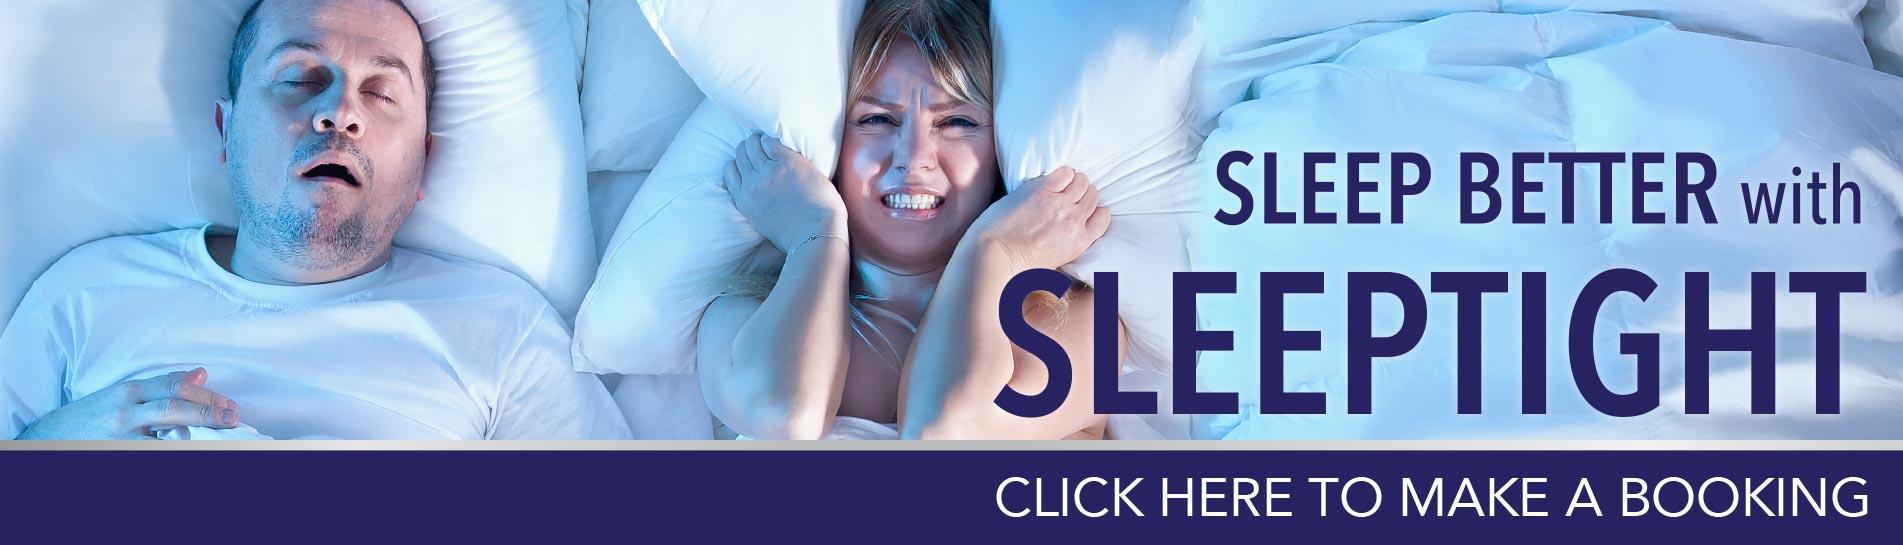 SleepTight quit snoring banner